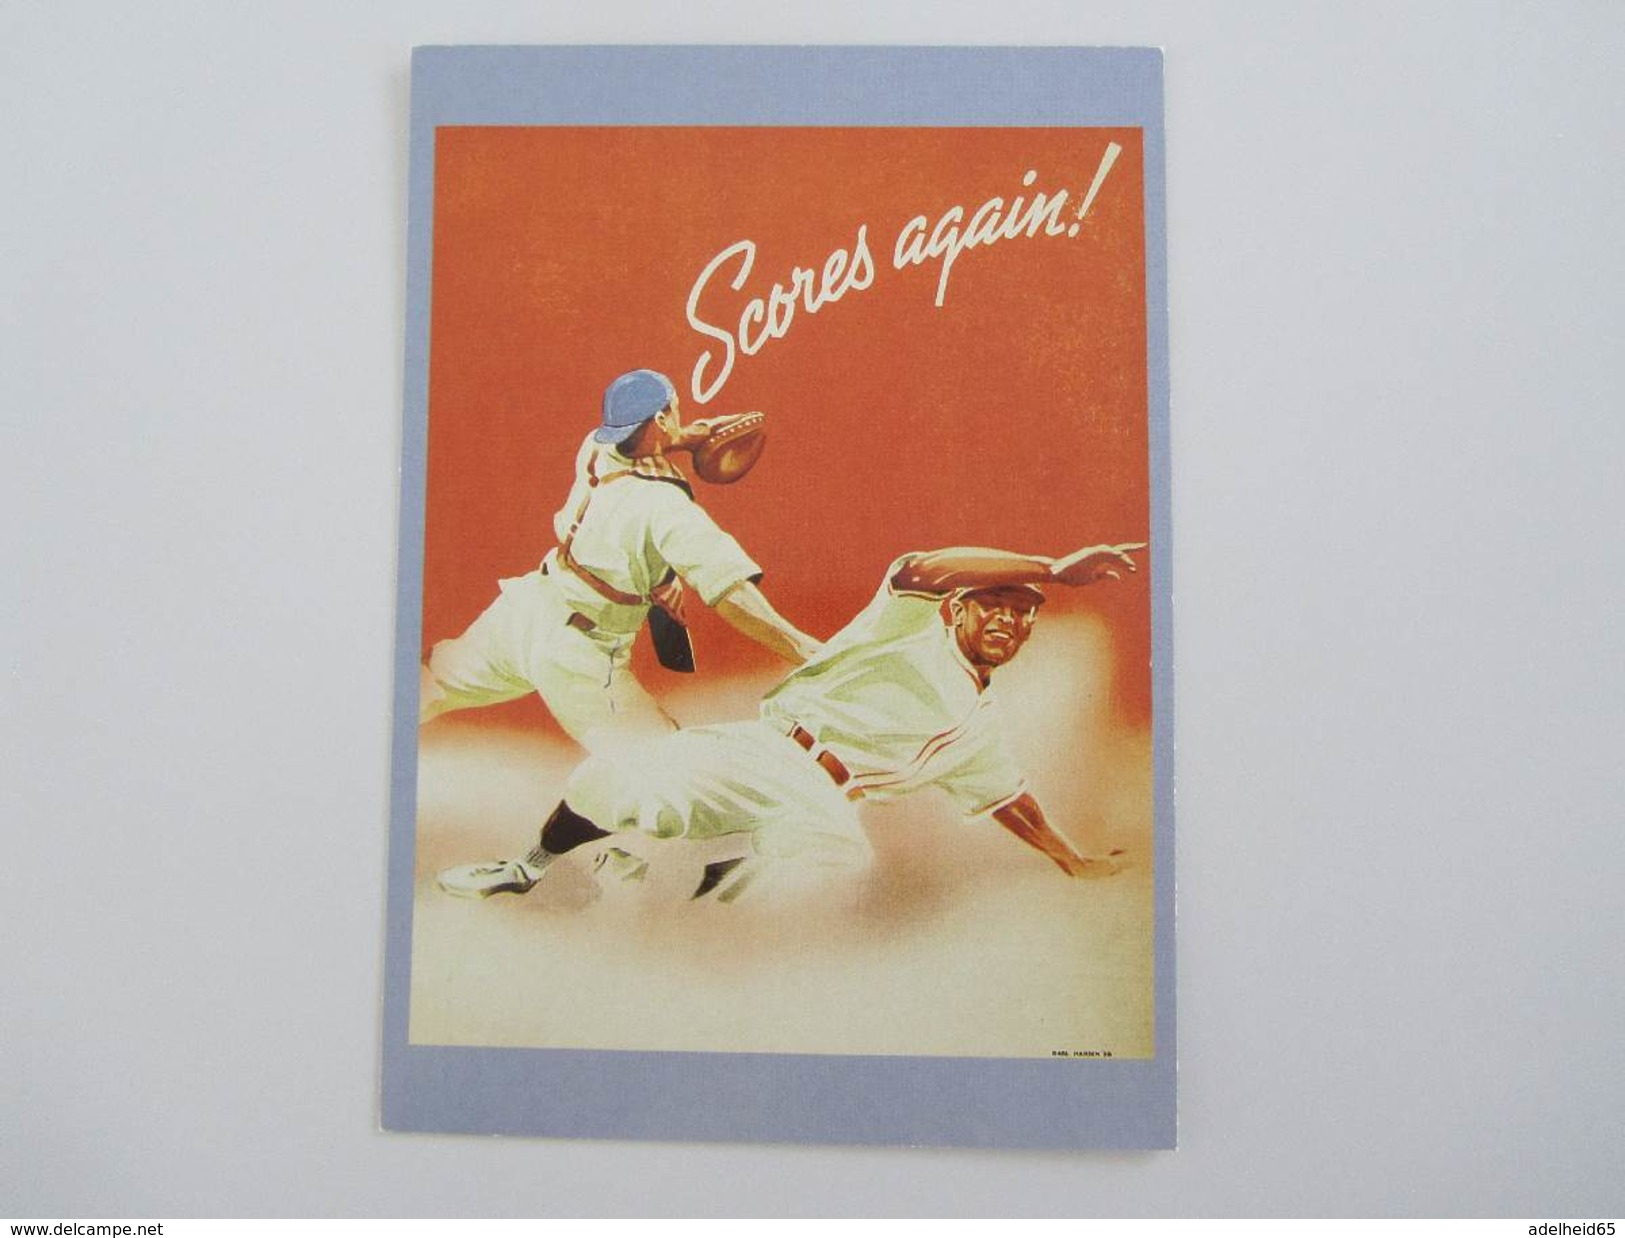 016C/ Baseball 'scores Again' (repro) Mad Dog West Palm Beach Publ. - Sportifs